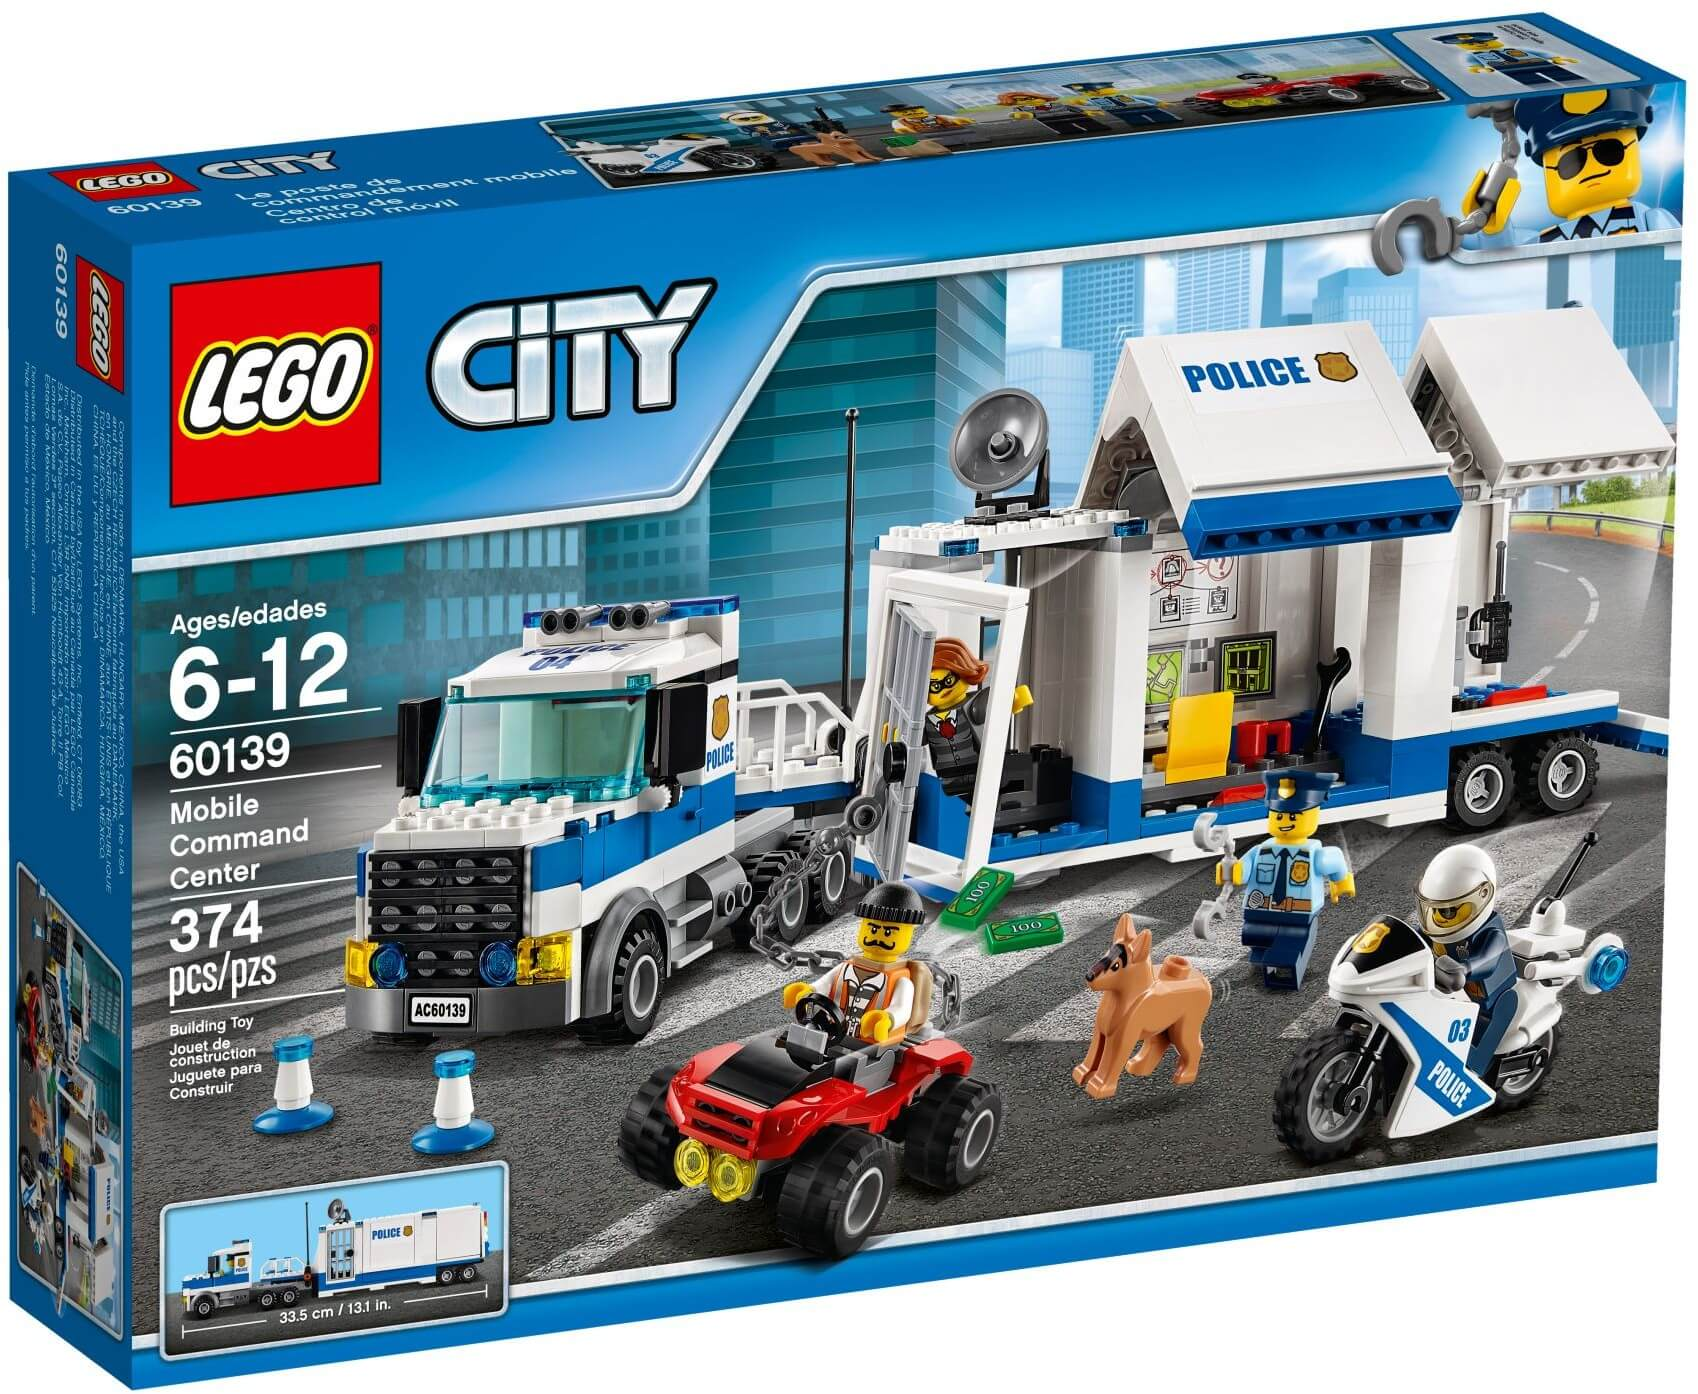 Mua đồ chơi LEGO 60139 - LEGO City 60139 - Xe Tải Cảnh Sát (LEGO 60139 Mobile Command Center)